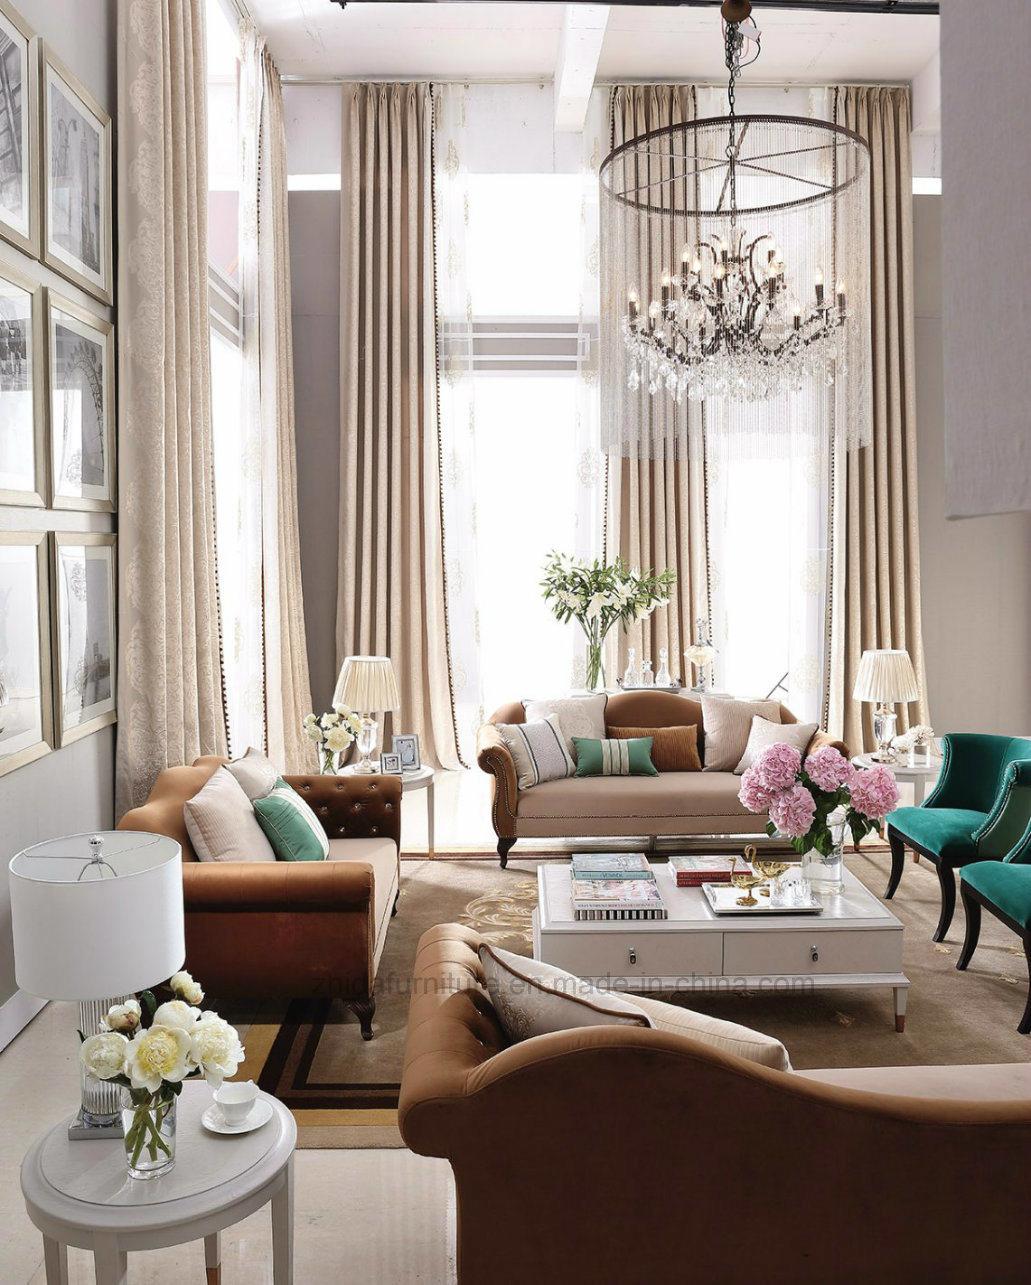 China High Quality Modern Clical Villa Furniture Living Room Sofa